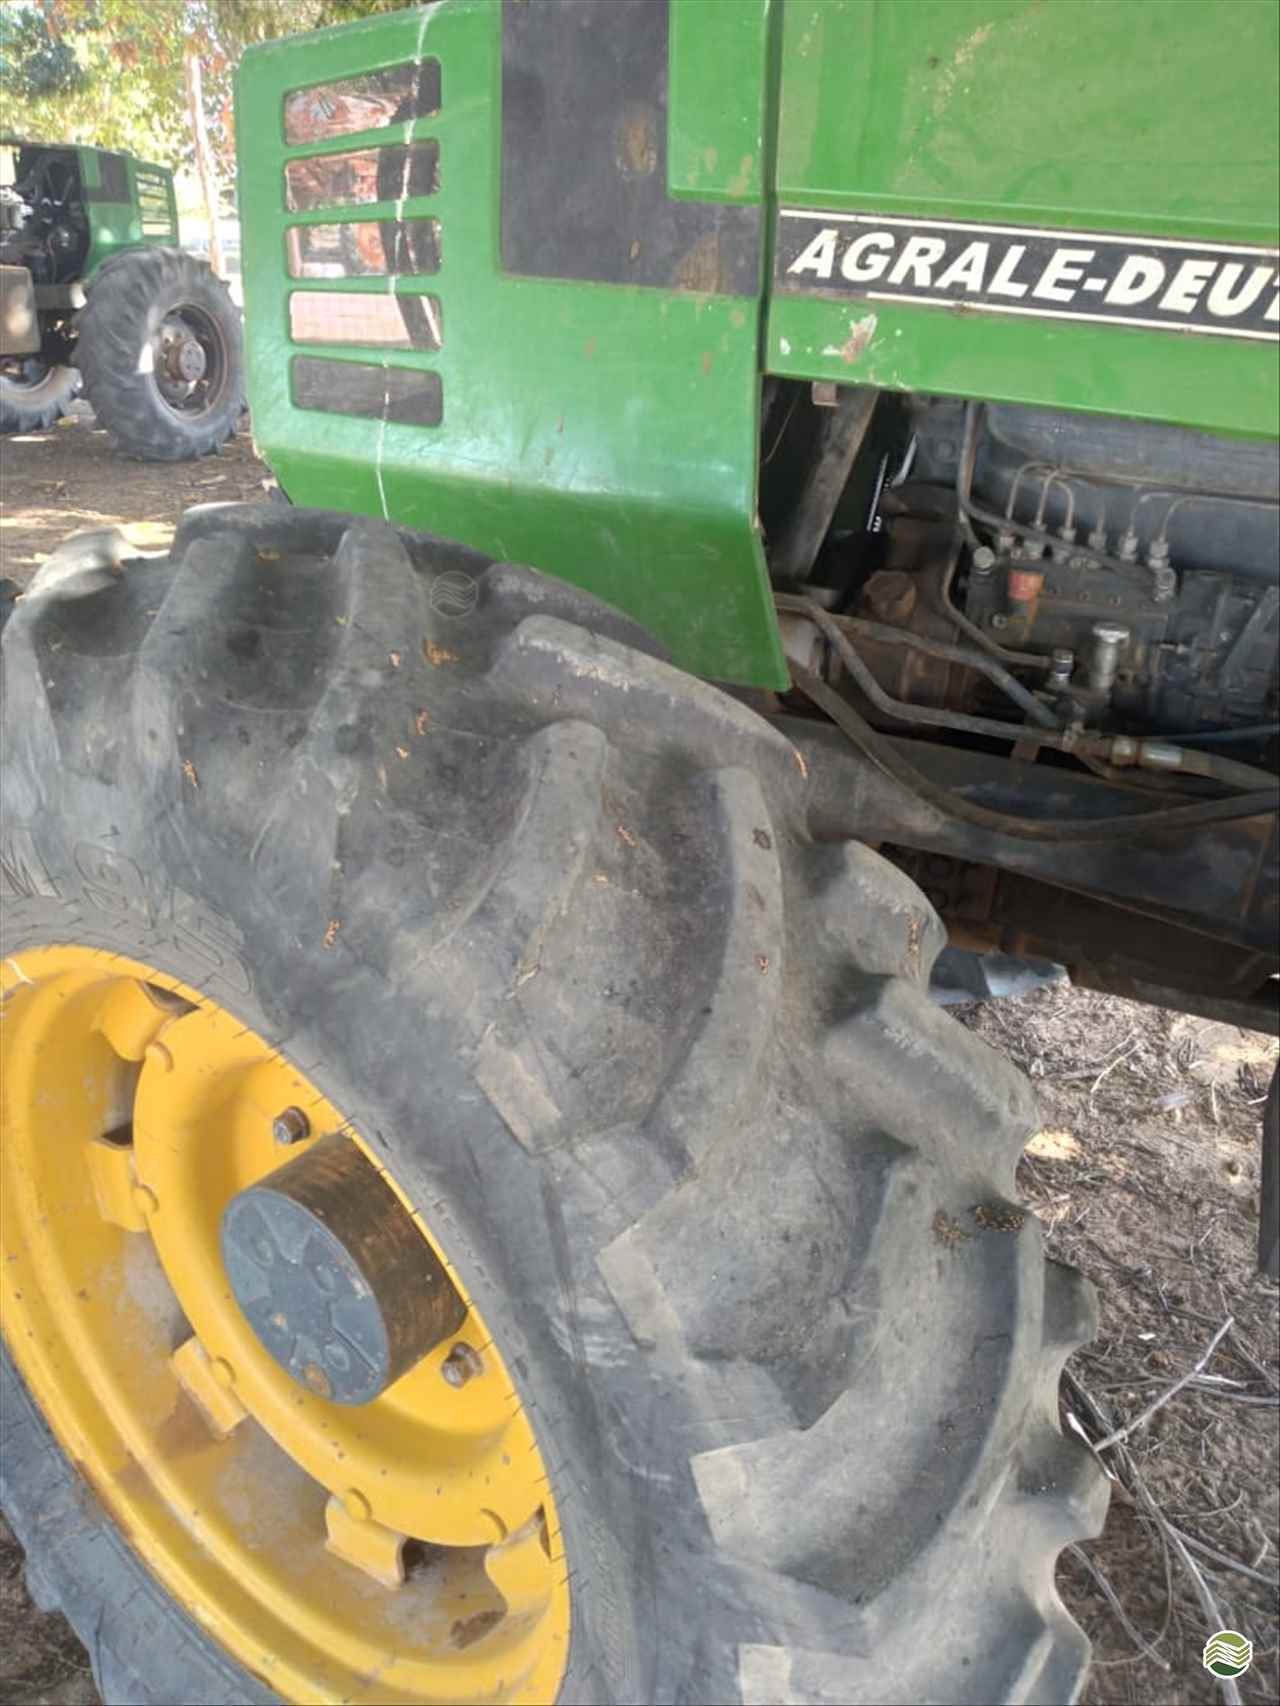 TRATOR AGRALE AGRALE 4150 Tração 4x4 Guimáquina Implementos Agrícolas - Jacto RONDONOPOLIS MATO GROSSO MT